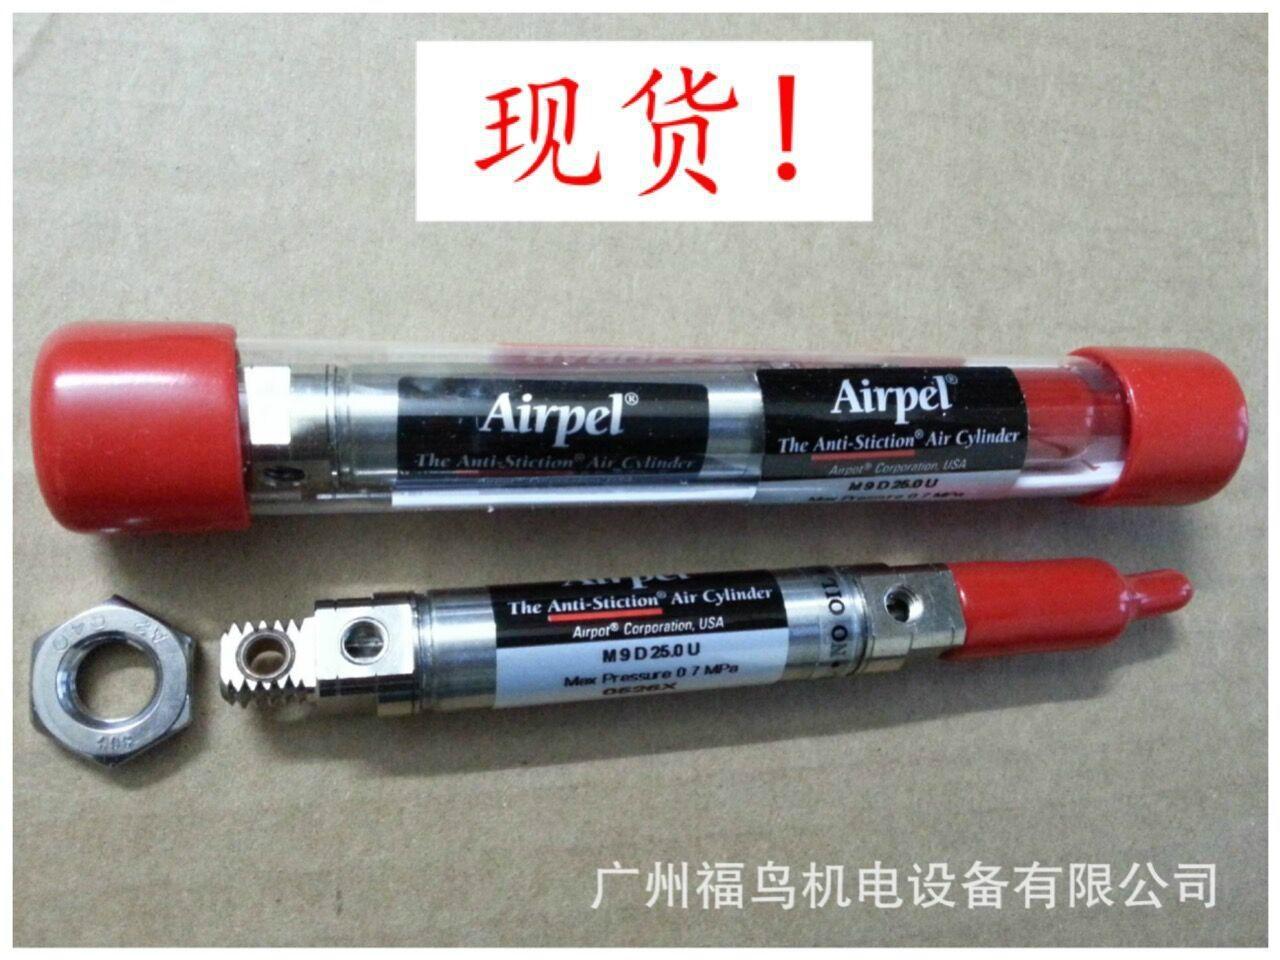 AIRPEL/AIRPOT玻璃氣缸, 型號: M9D25.0U